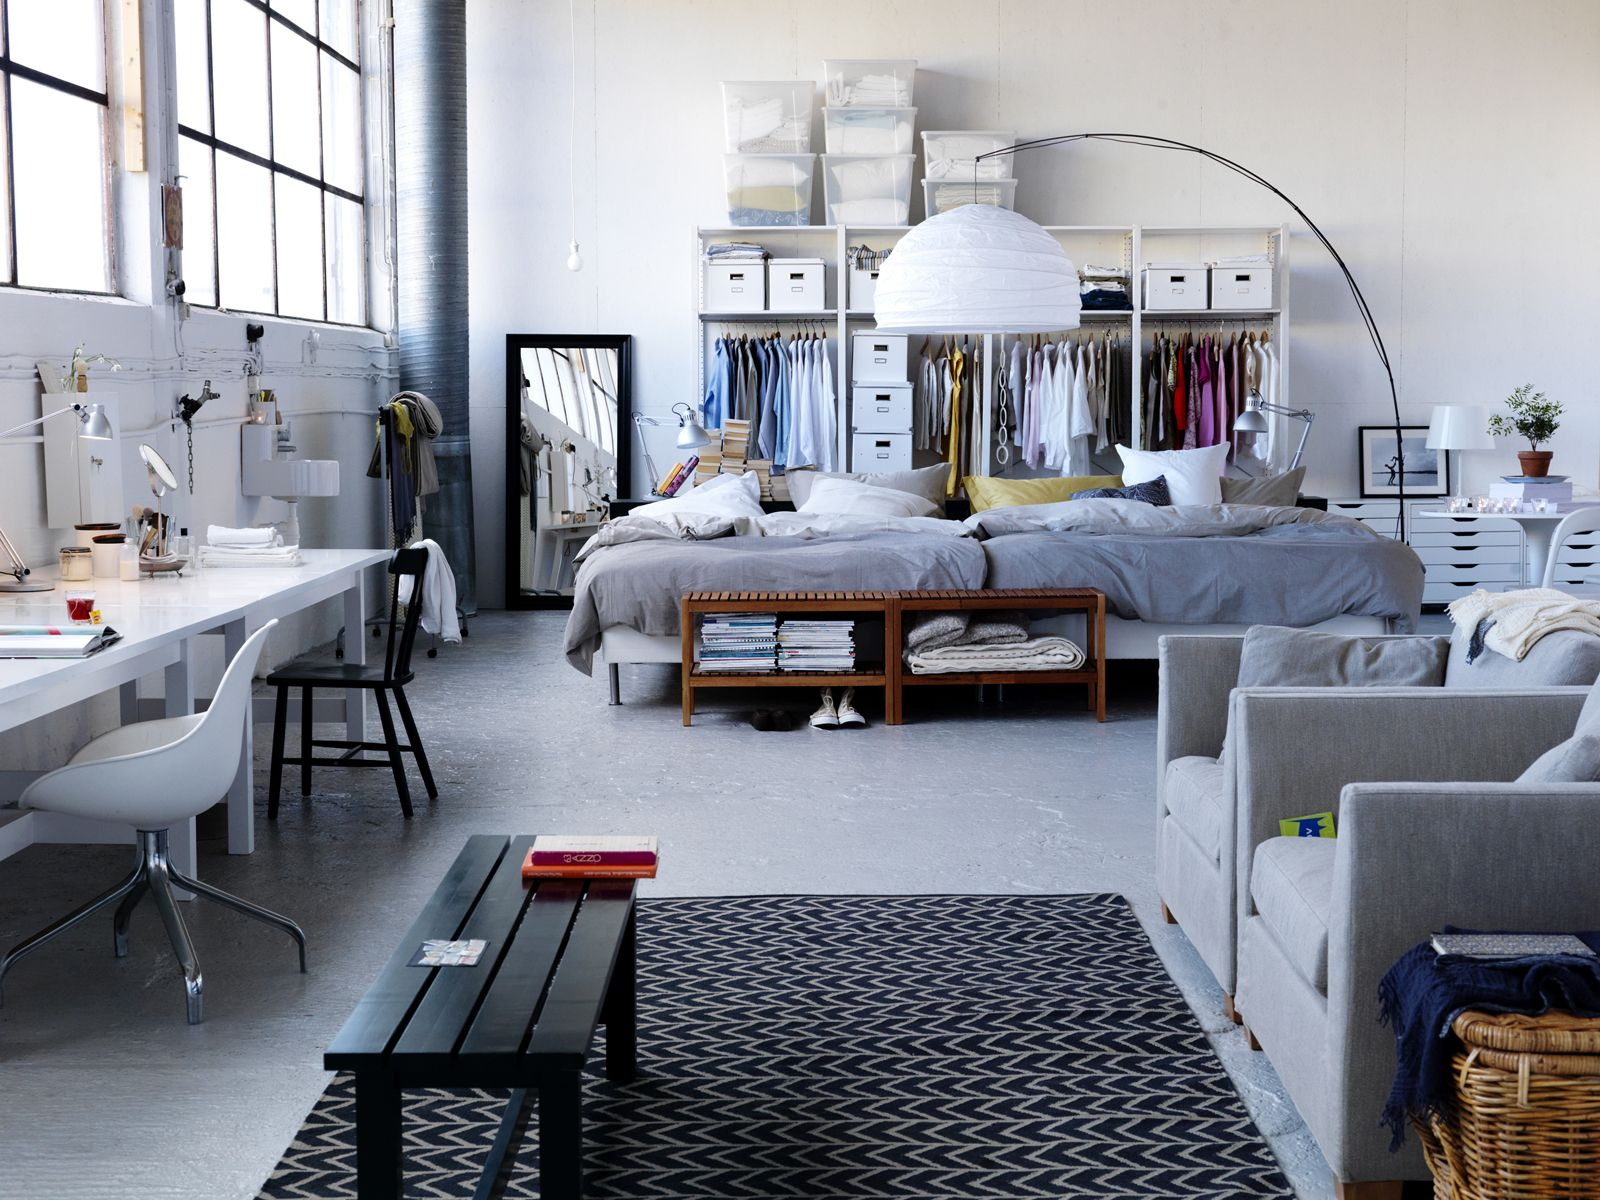 studio apartment ikea home decorating pinterest. Black Bedroom Furniture Sets. Home Design Ideas